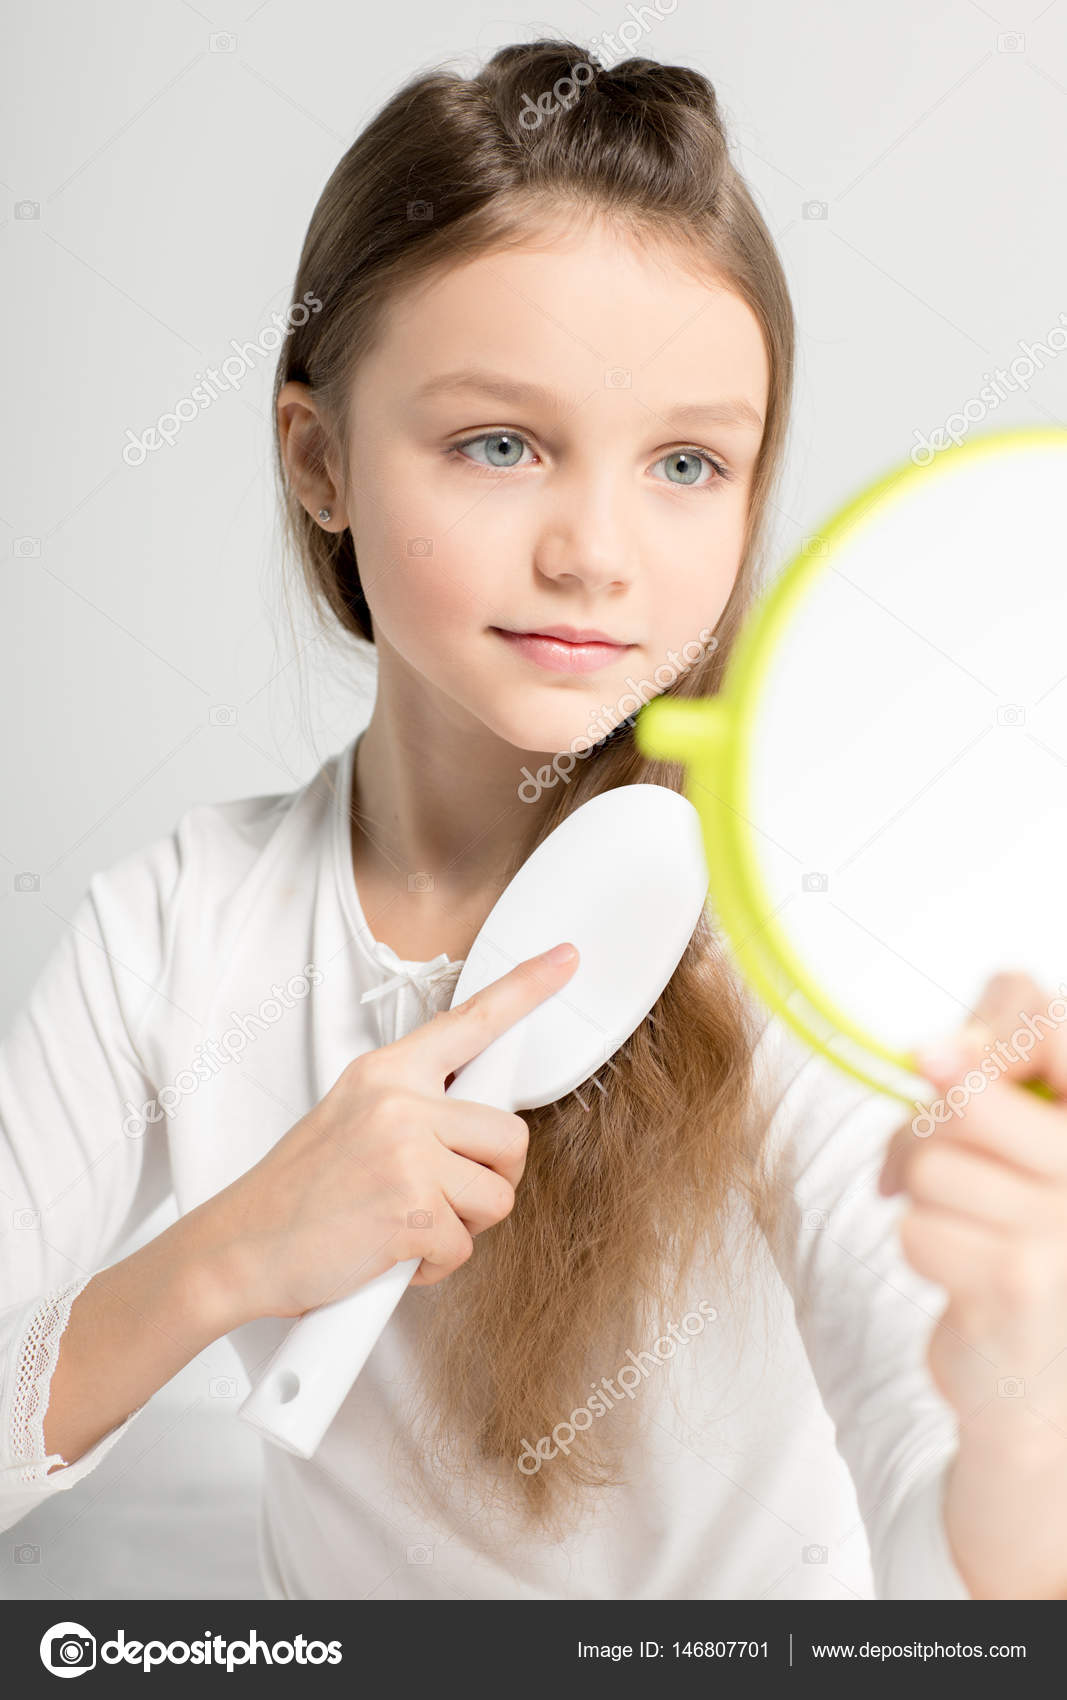 hair stock photos - photo #47